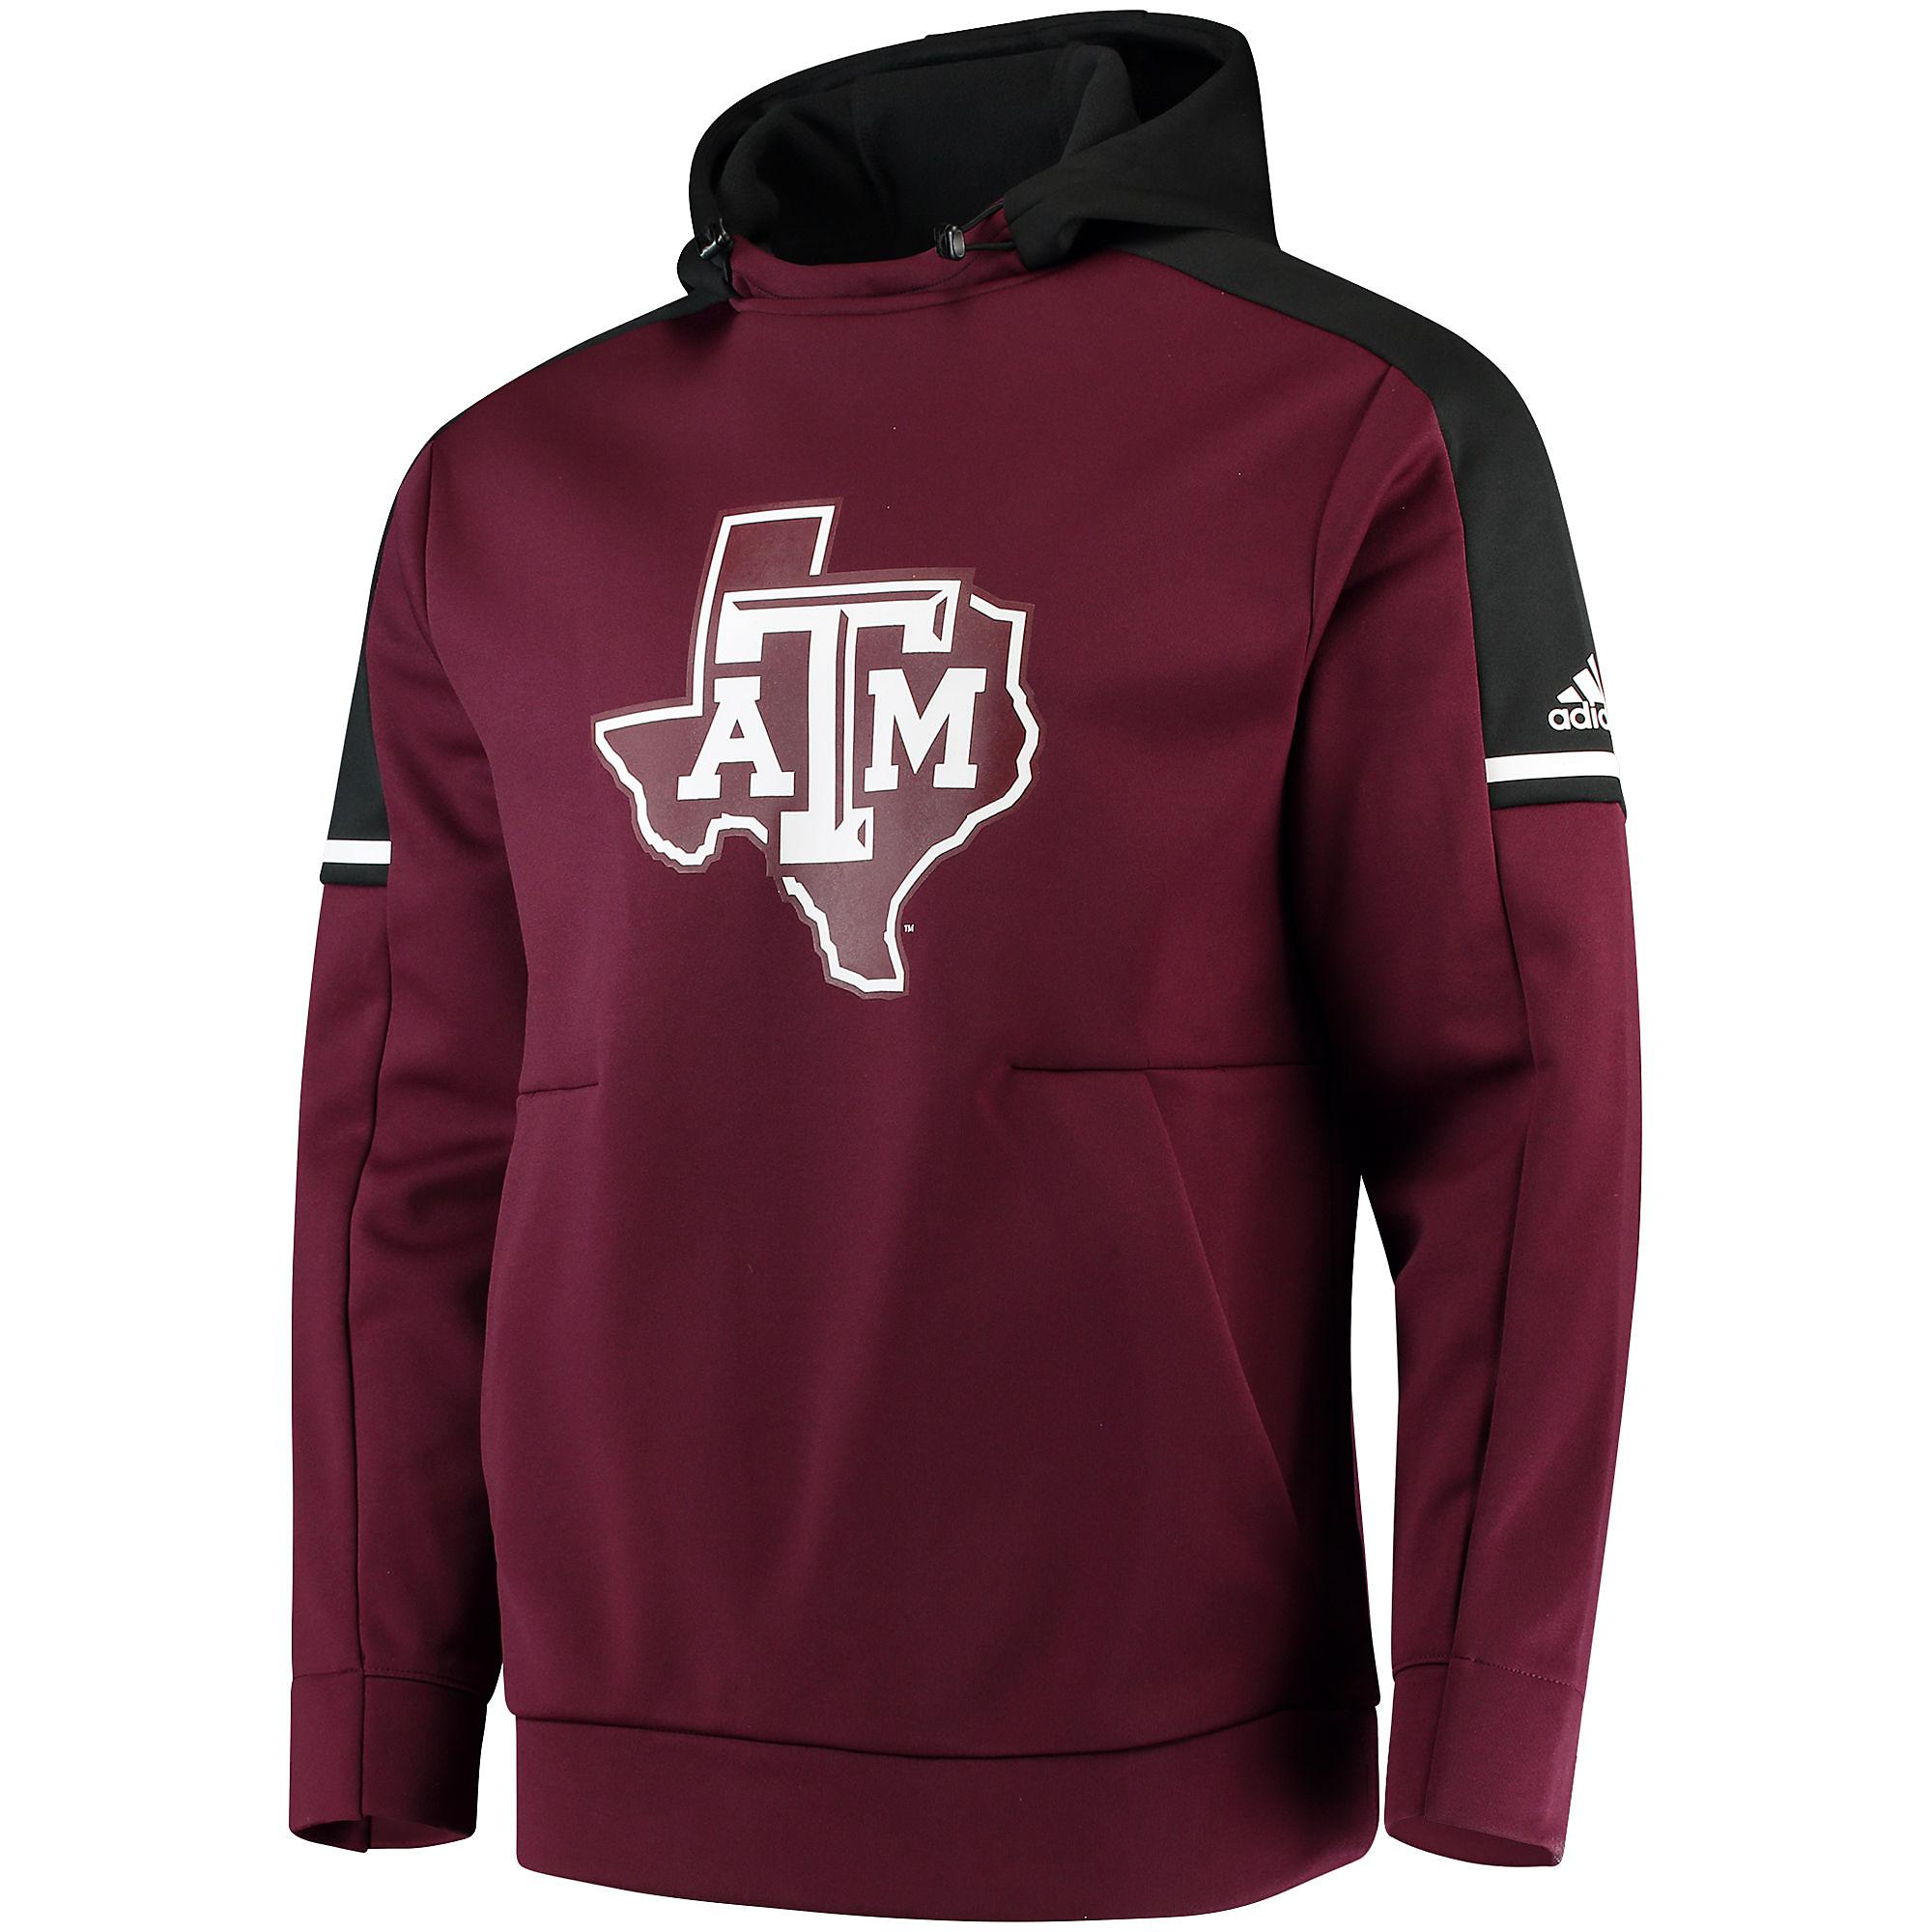 Texas A&M Aggies adidas Sideline Player Hoody